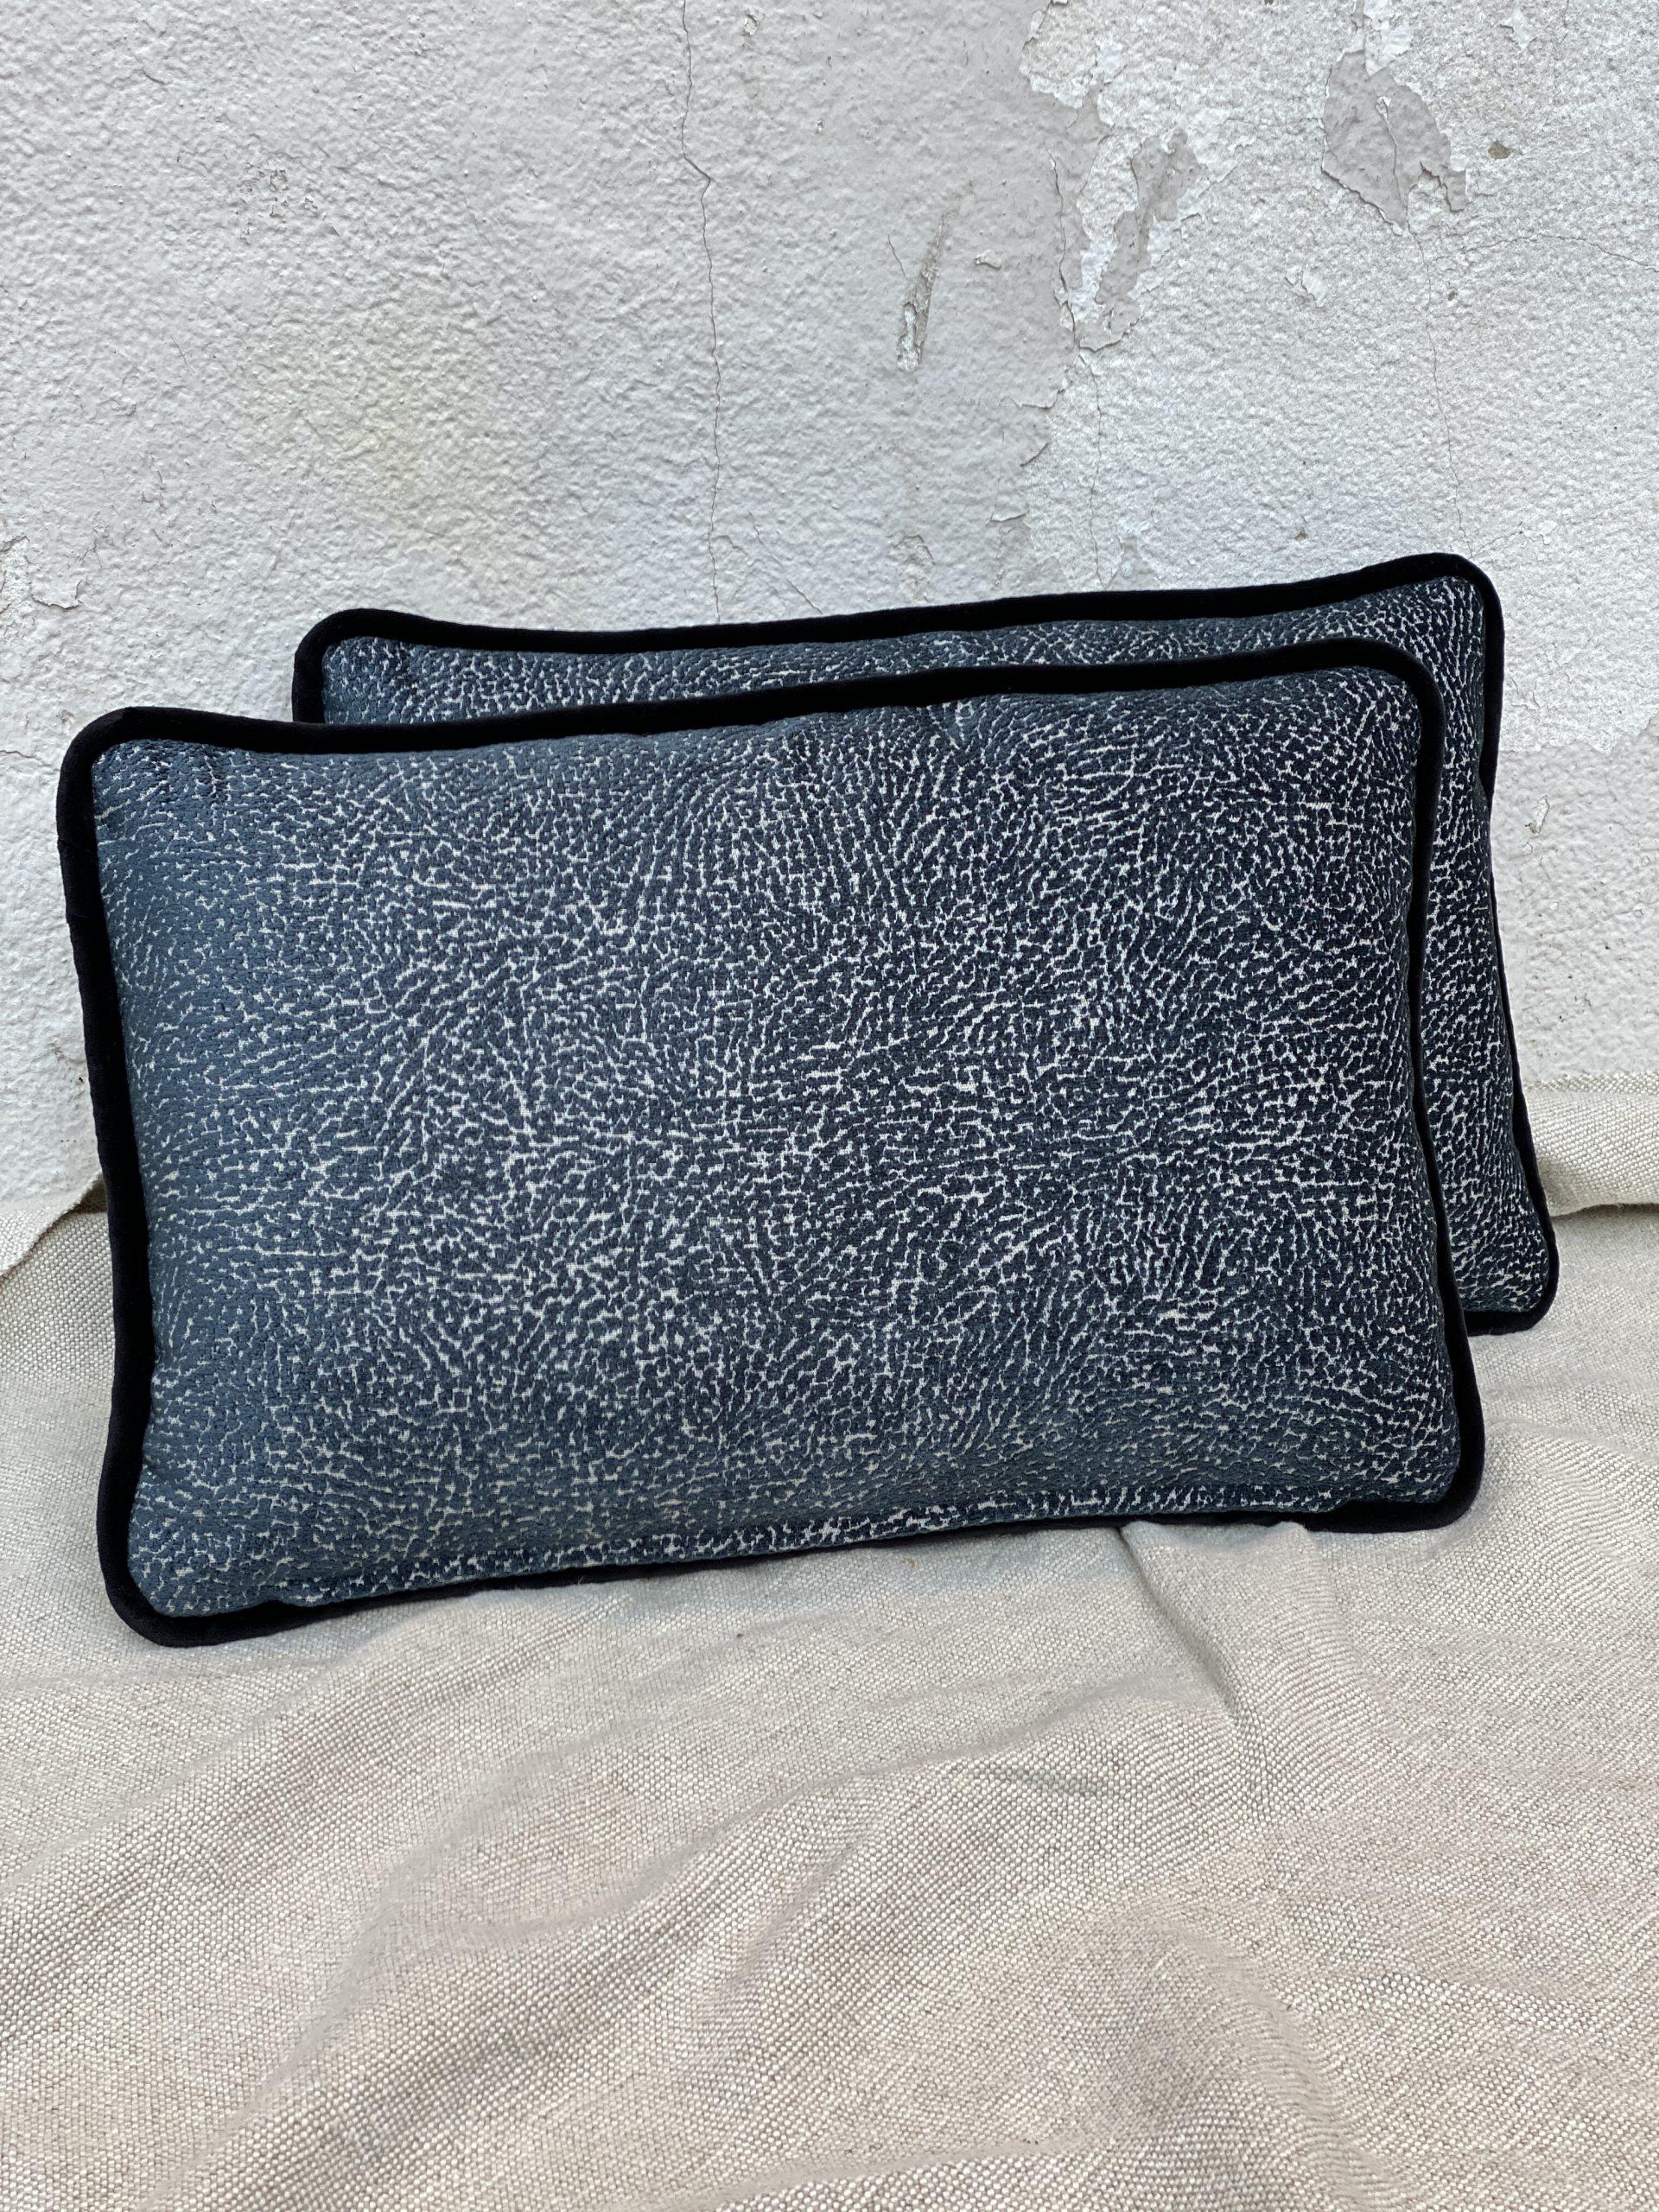 Clarke & Clarke Pillows